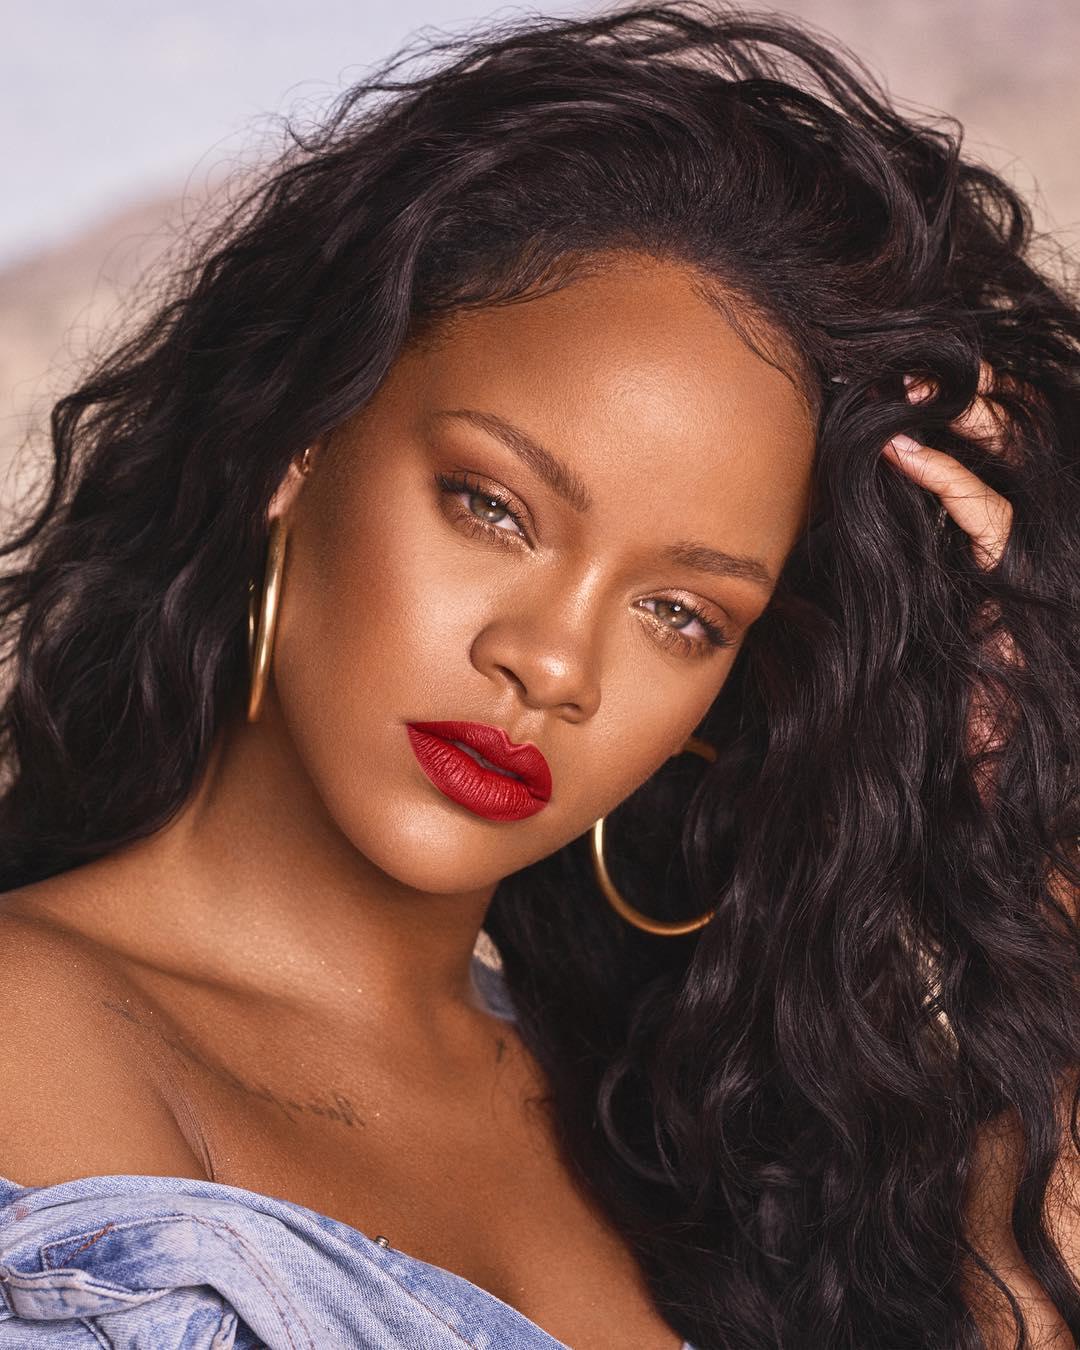 ba4daa5ea43 Rihanna s Savage x Fenty Lingerie Line Is Almost Here